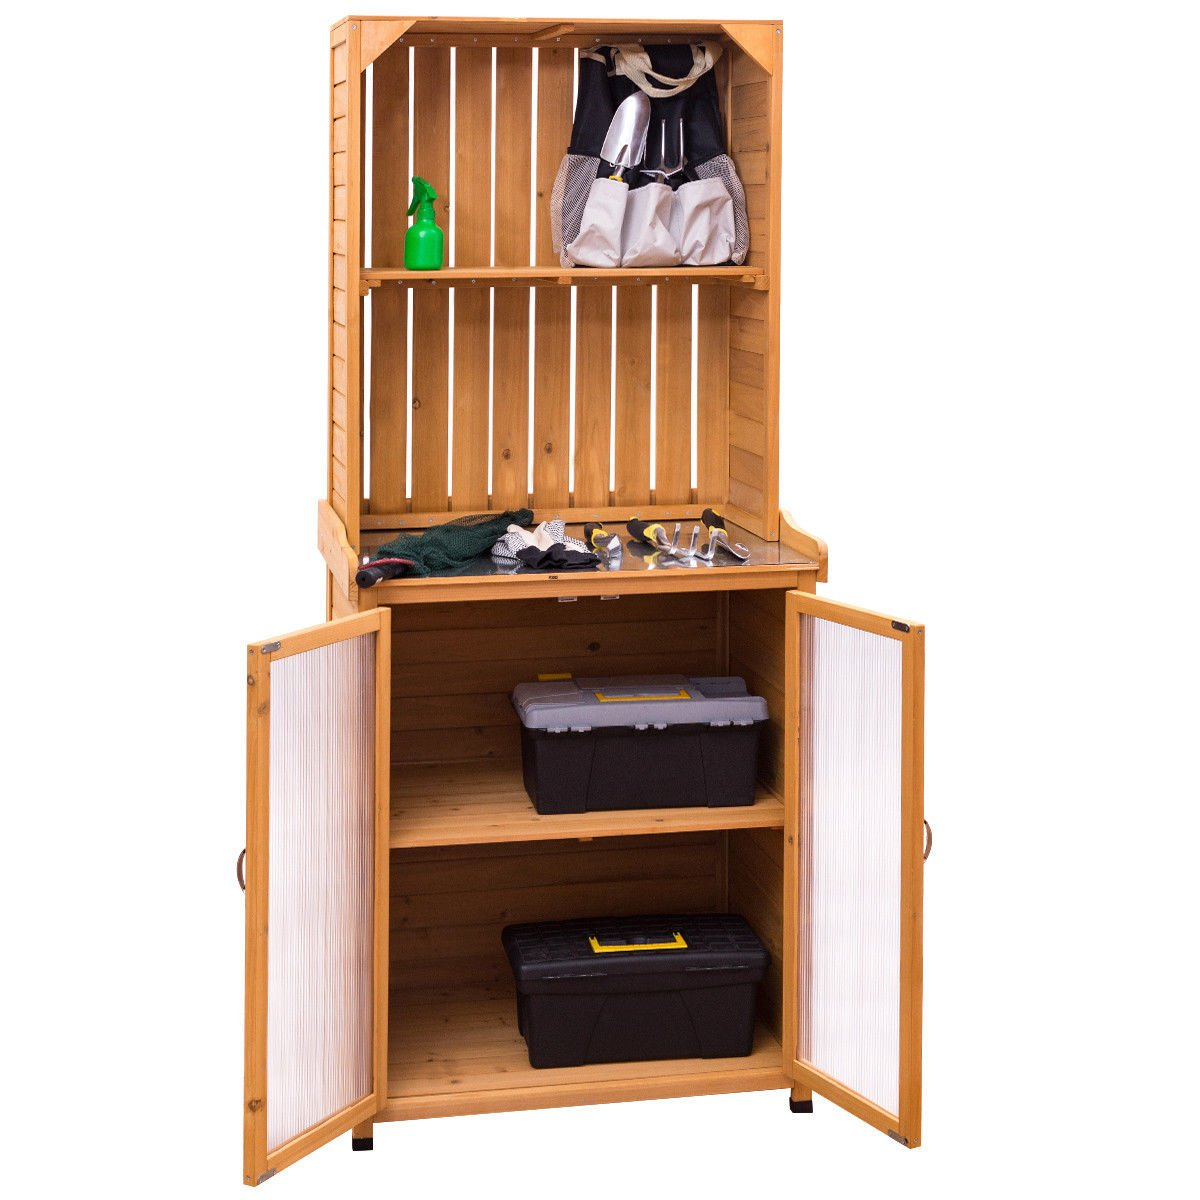 Garden Shed Potting Bench Cabinet Storage Wooden Tools Organizer